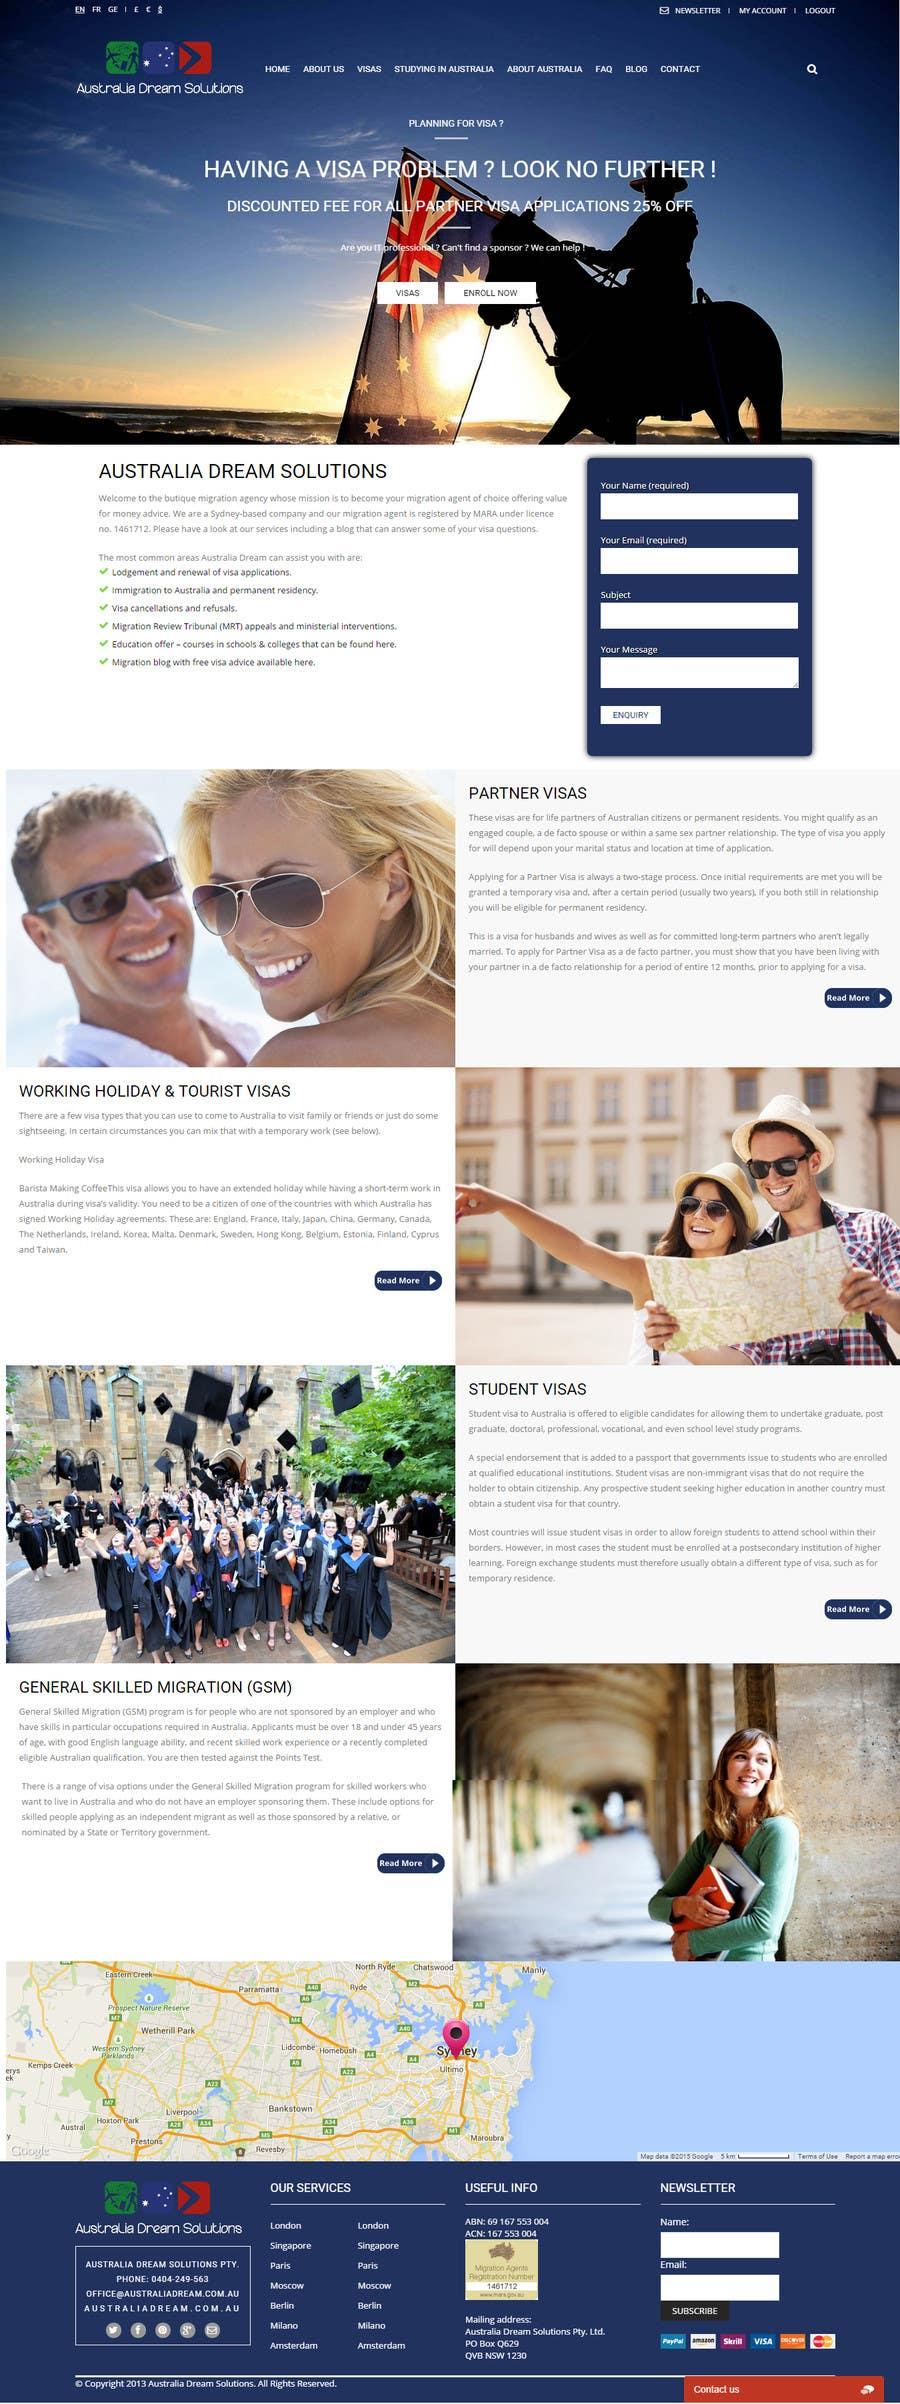 Kilpailutyö #16 kilpailussa Home page redesign by making it sales-focused (legal services).